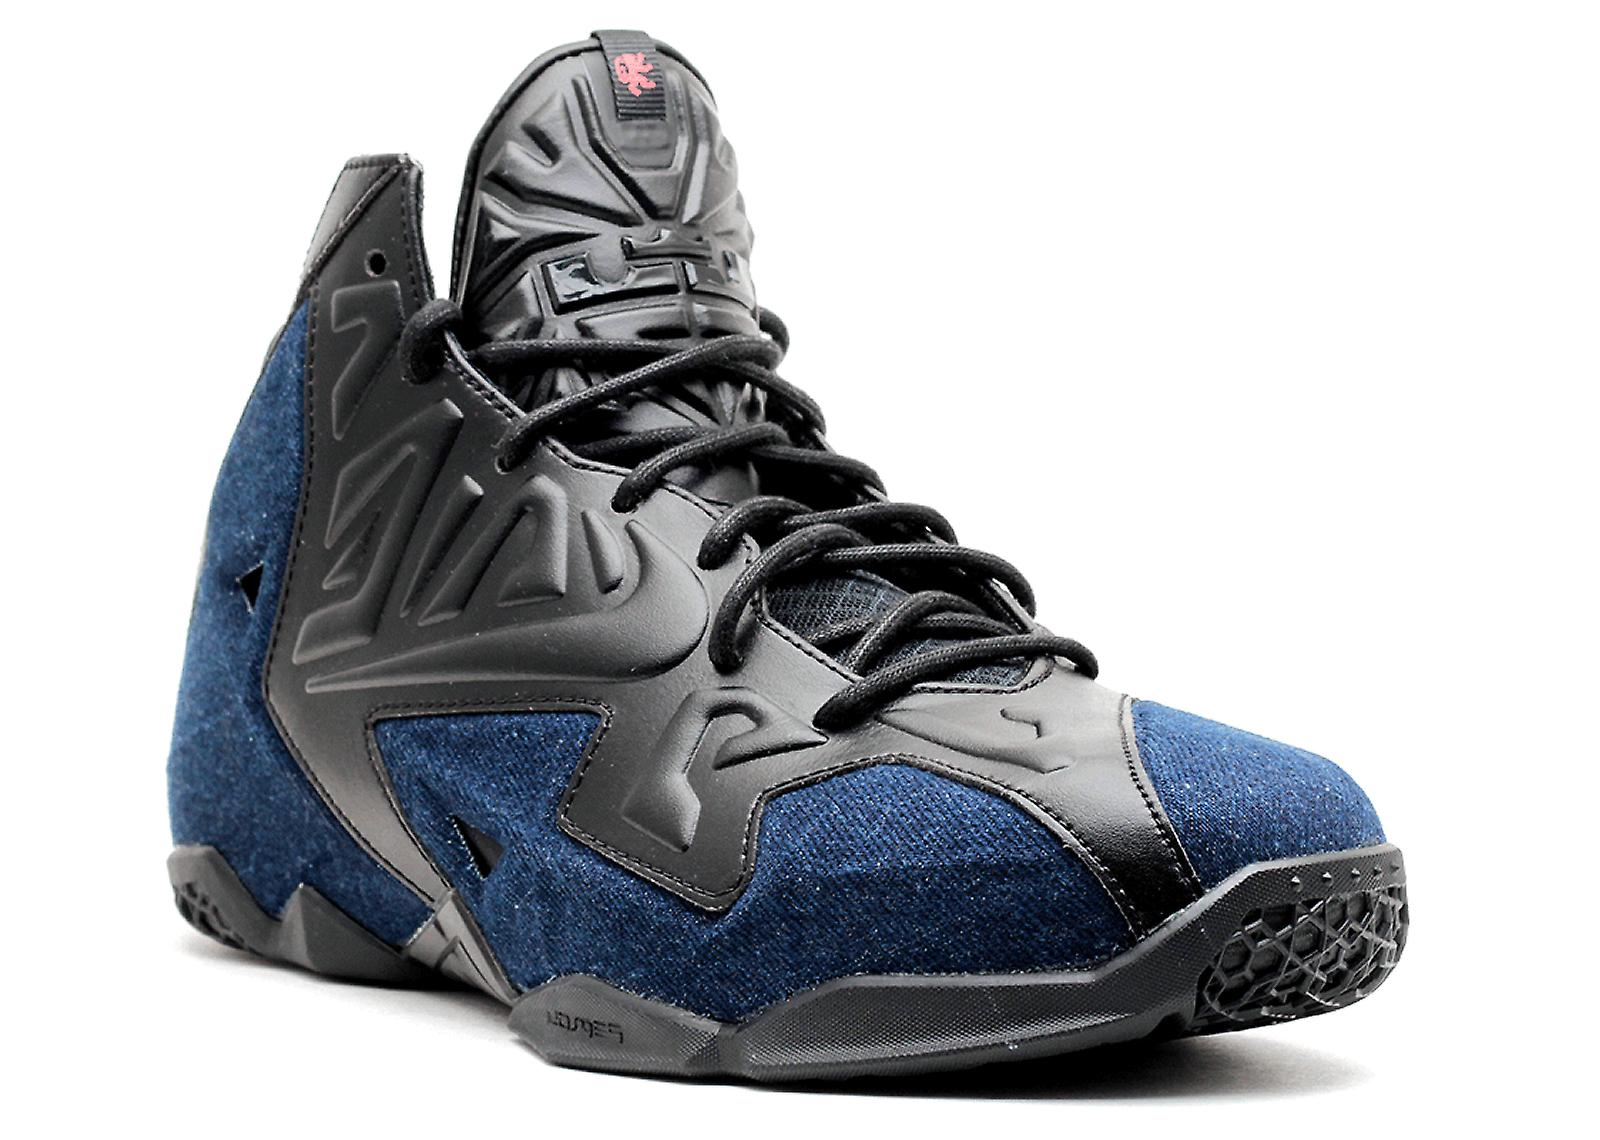 LeBron 11 Ext Denim Qs  Denim  - 659509 - 004 - chaussures